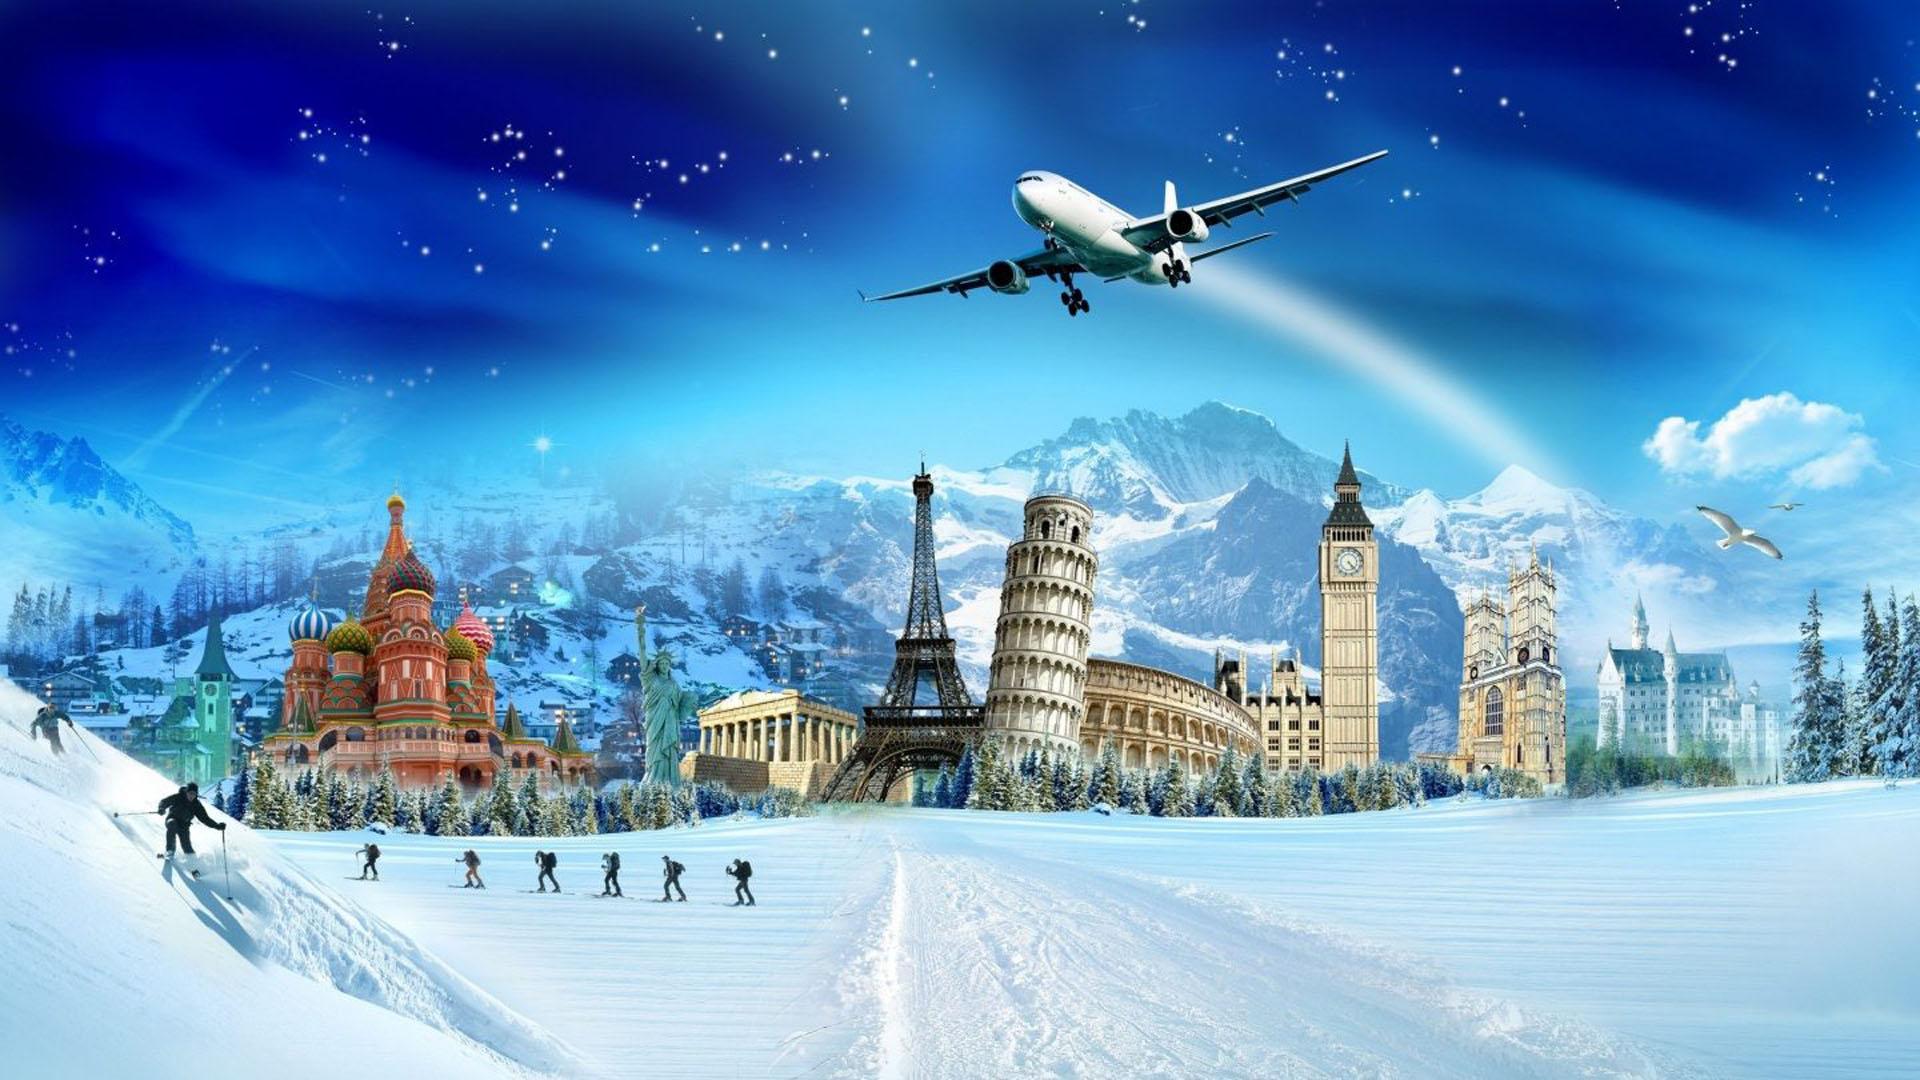 Tour Operator Europe Europe Travel Agency European Travel Company 1920x1080